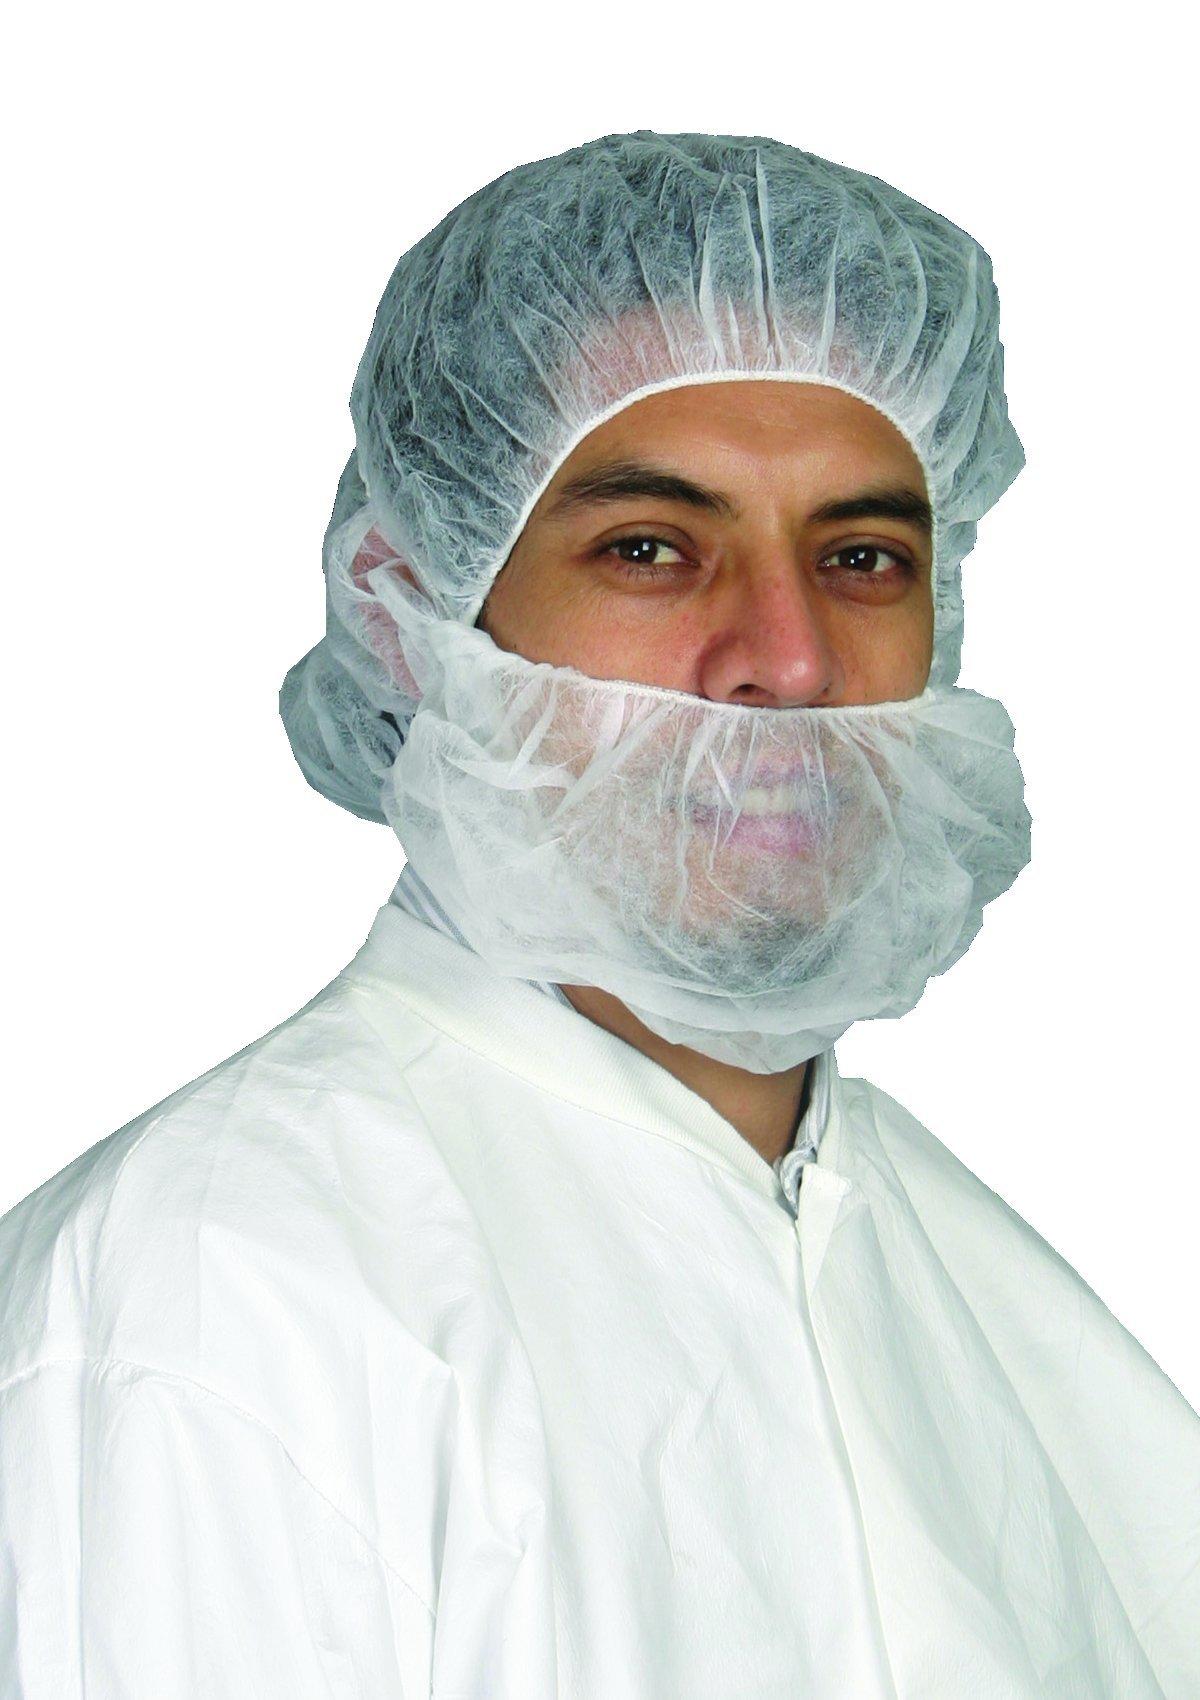 Epic 90088-5 Polypropylene Beard Covers, Capacity, Volume, Polypropylene, Universal, White (Pack of 500)